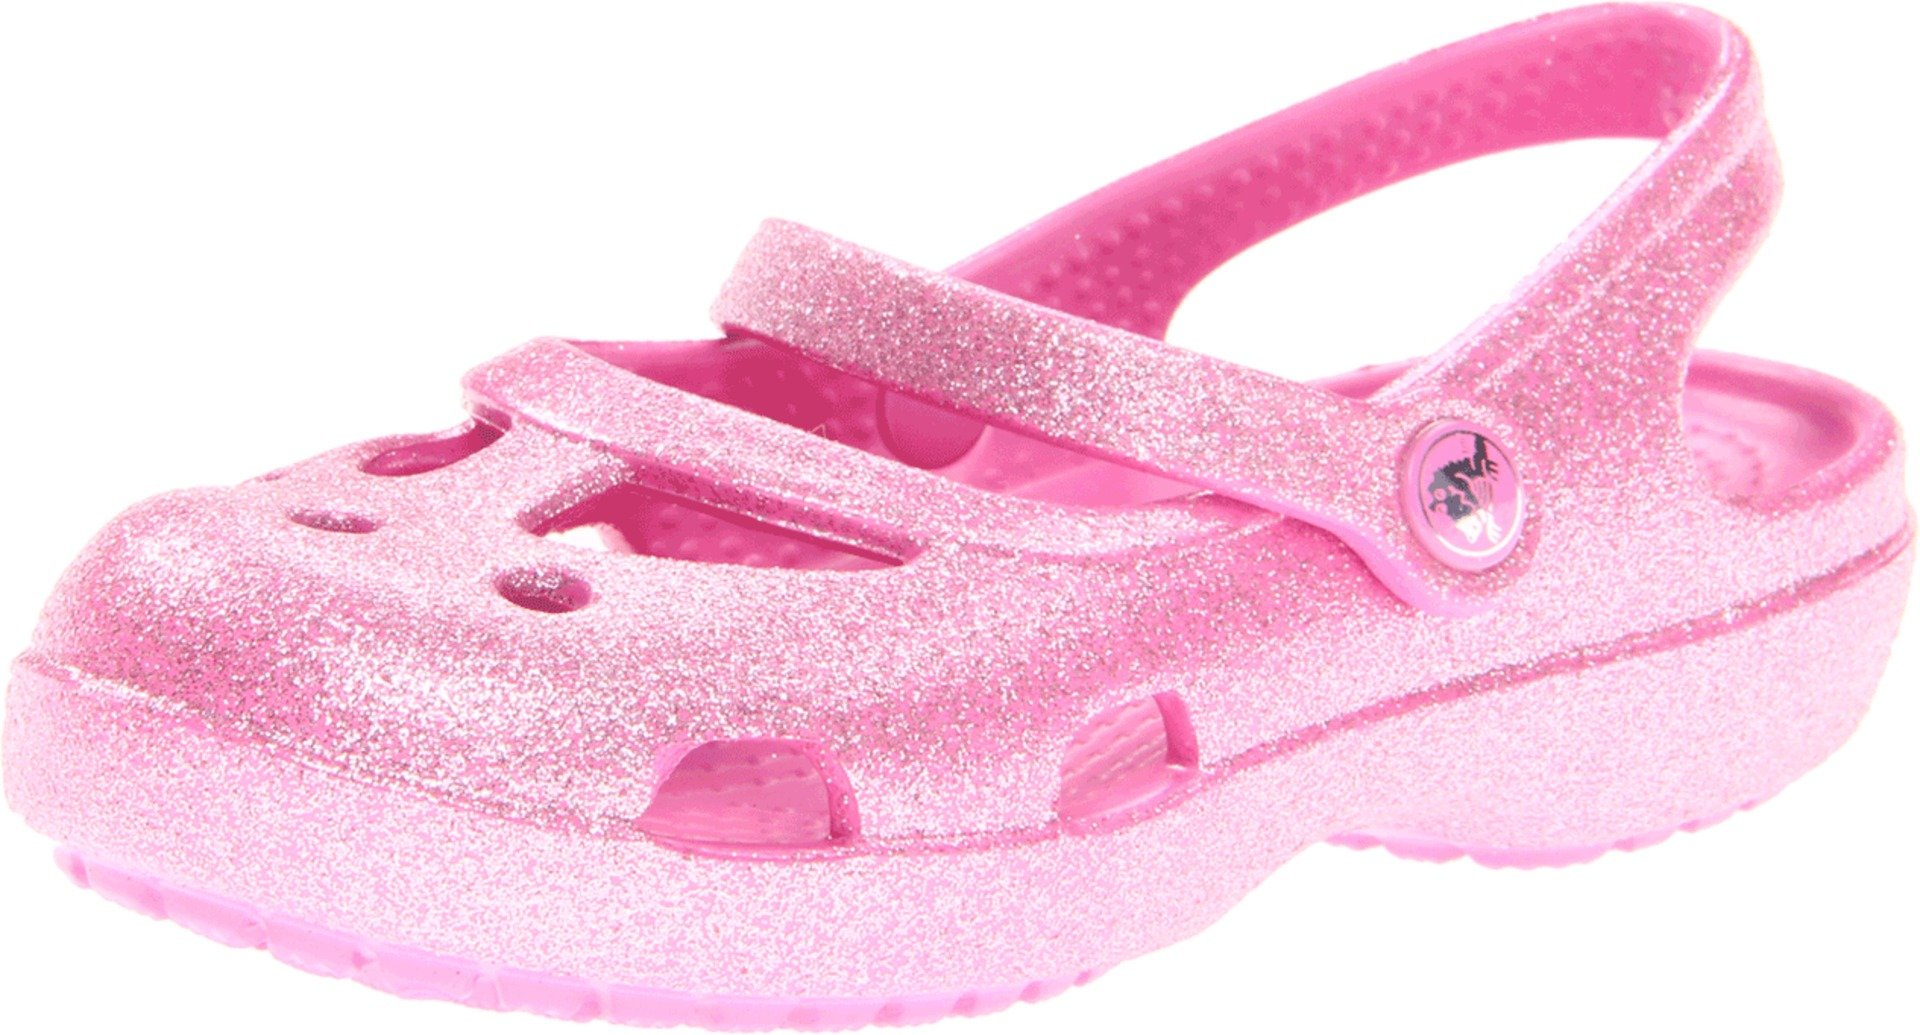 crocs 14478 Shayna Glitter Sandal (Toddler/Little Kid),Party Pink,6 M US Toddler